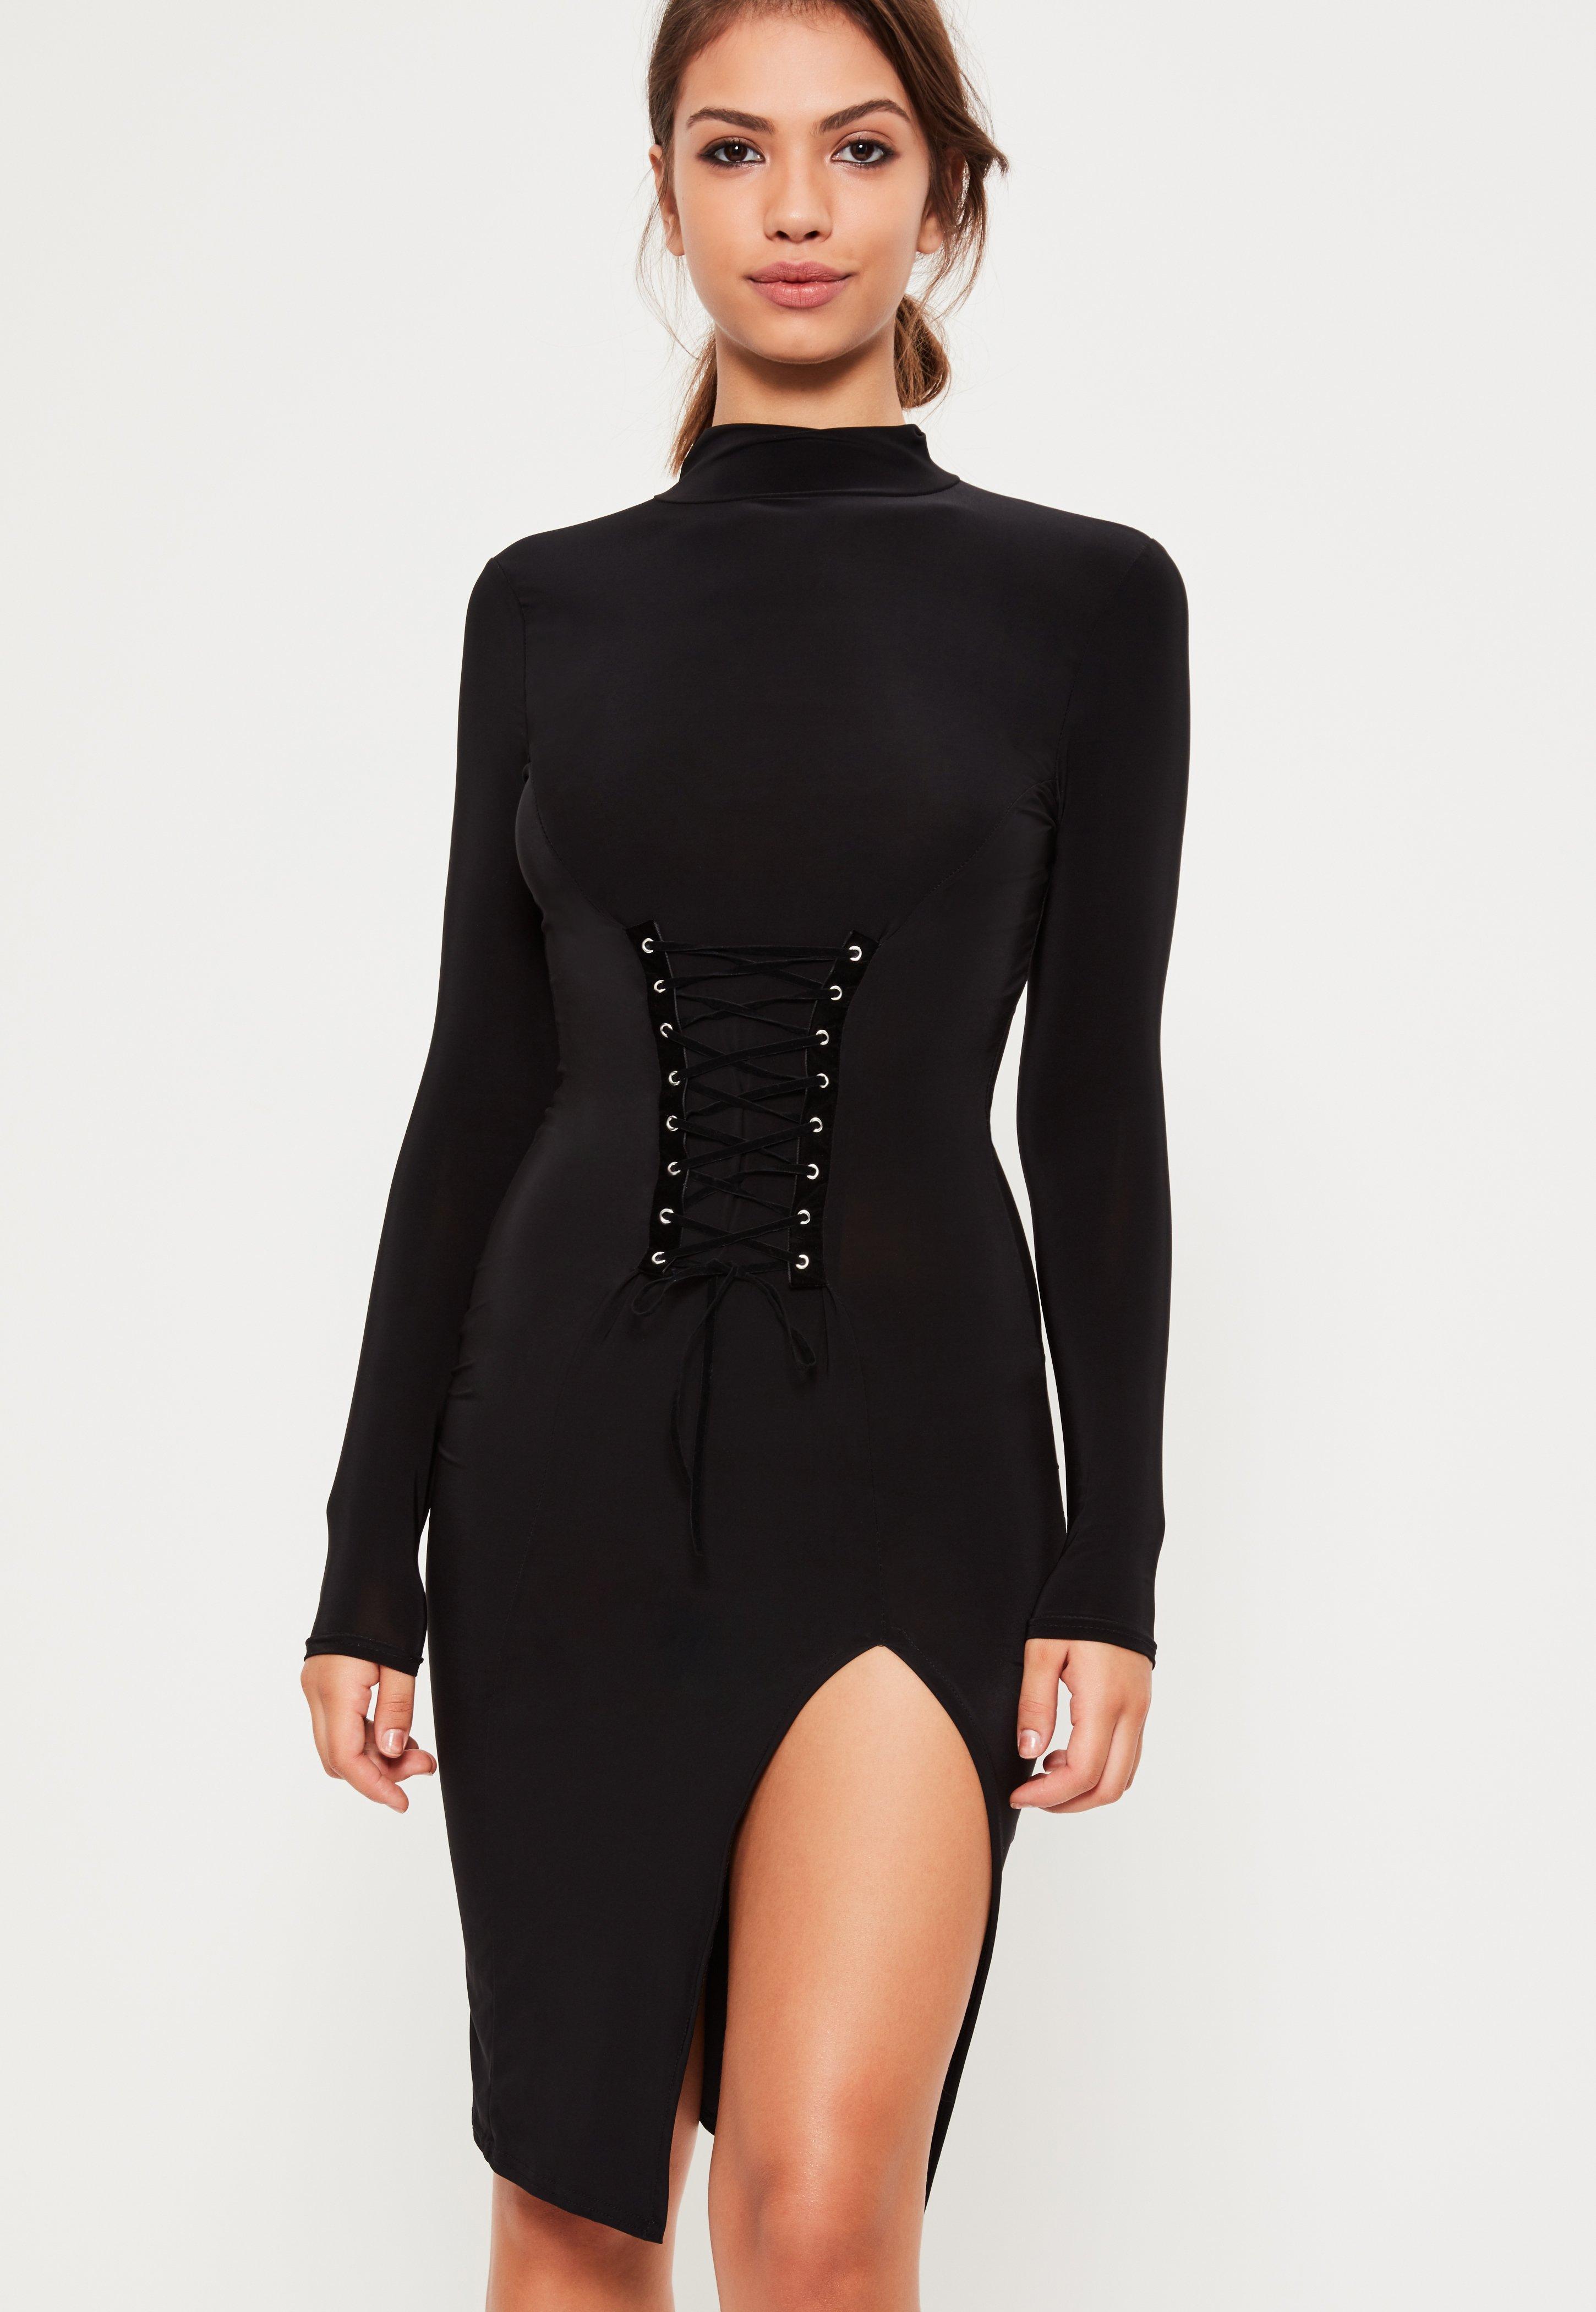 Black Slinky Corset Detail Bodycon Dress